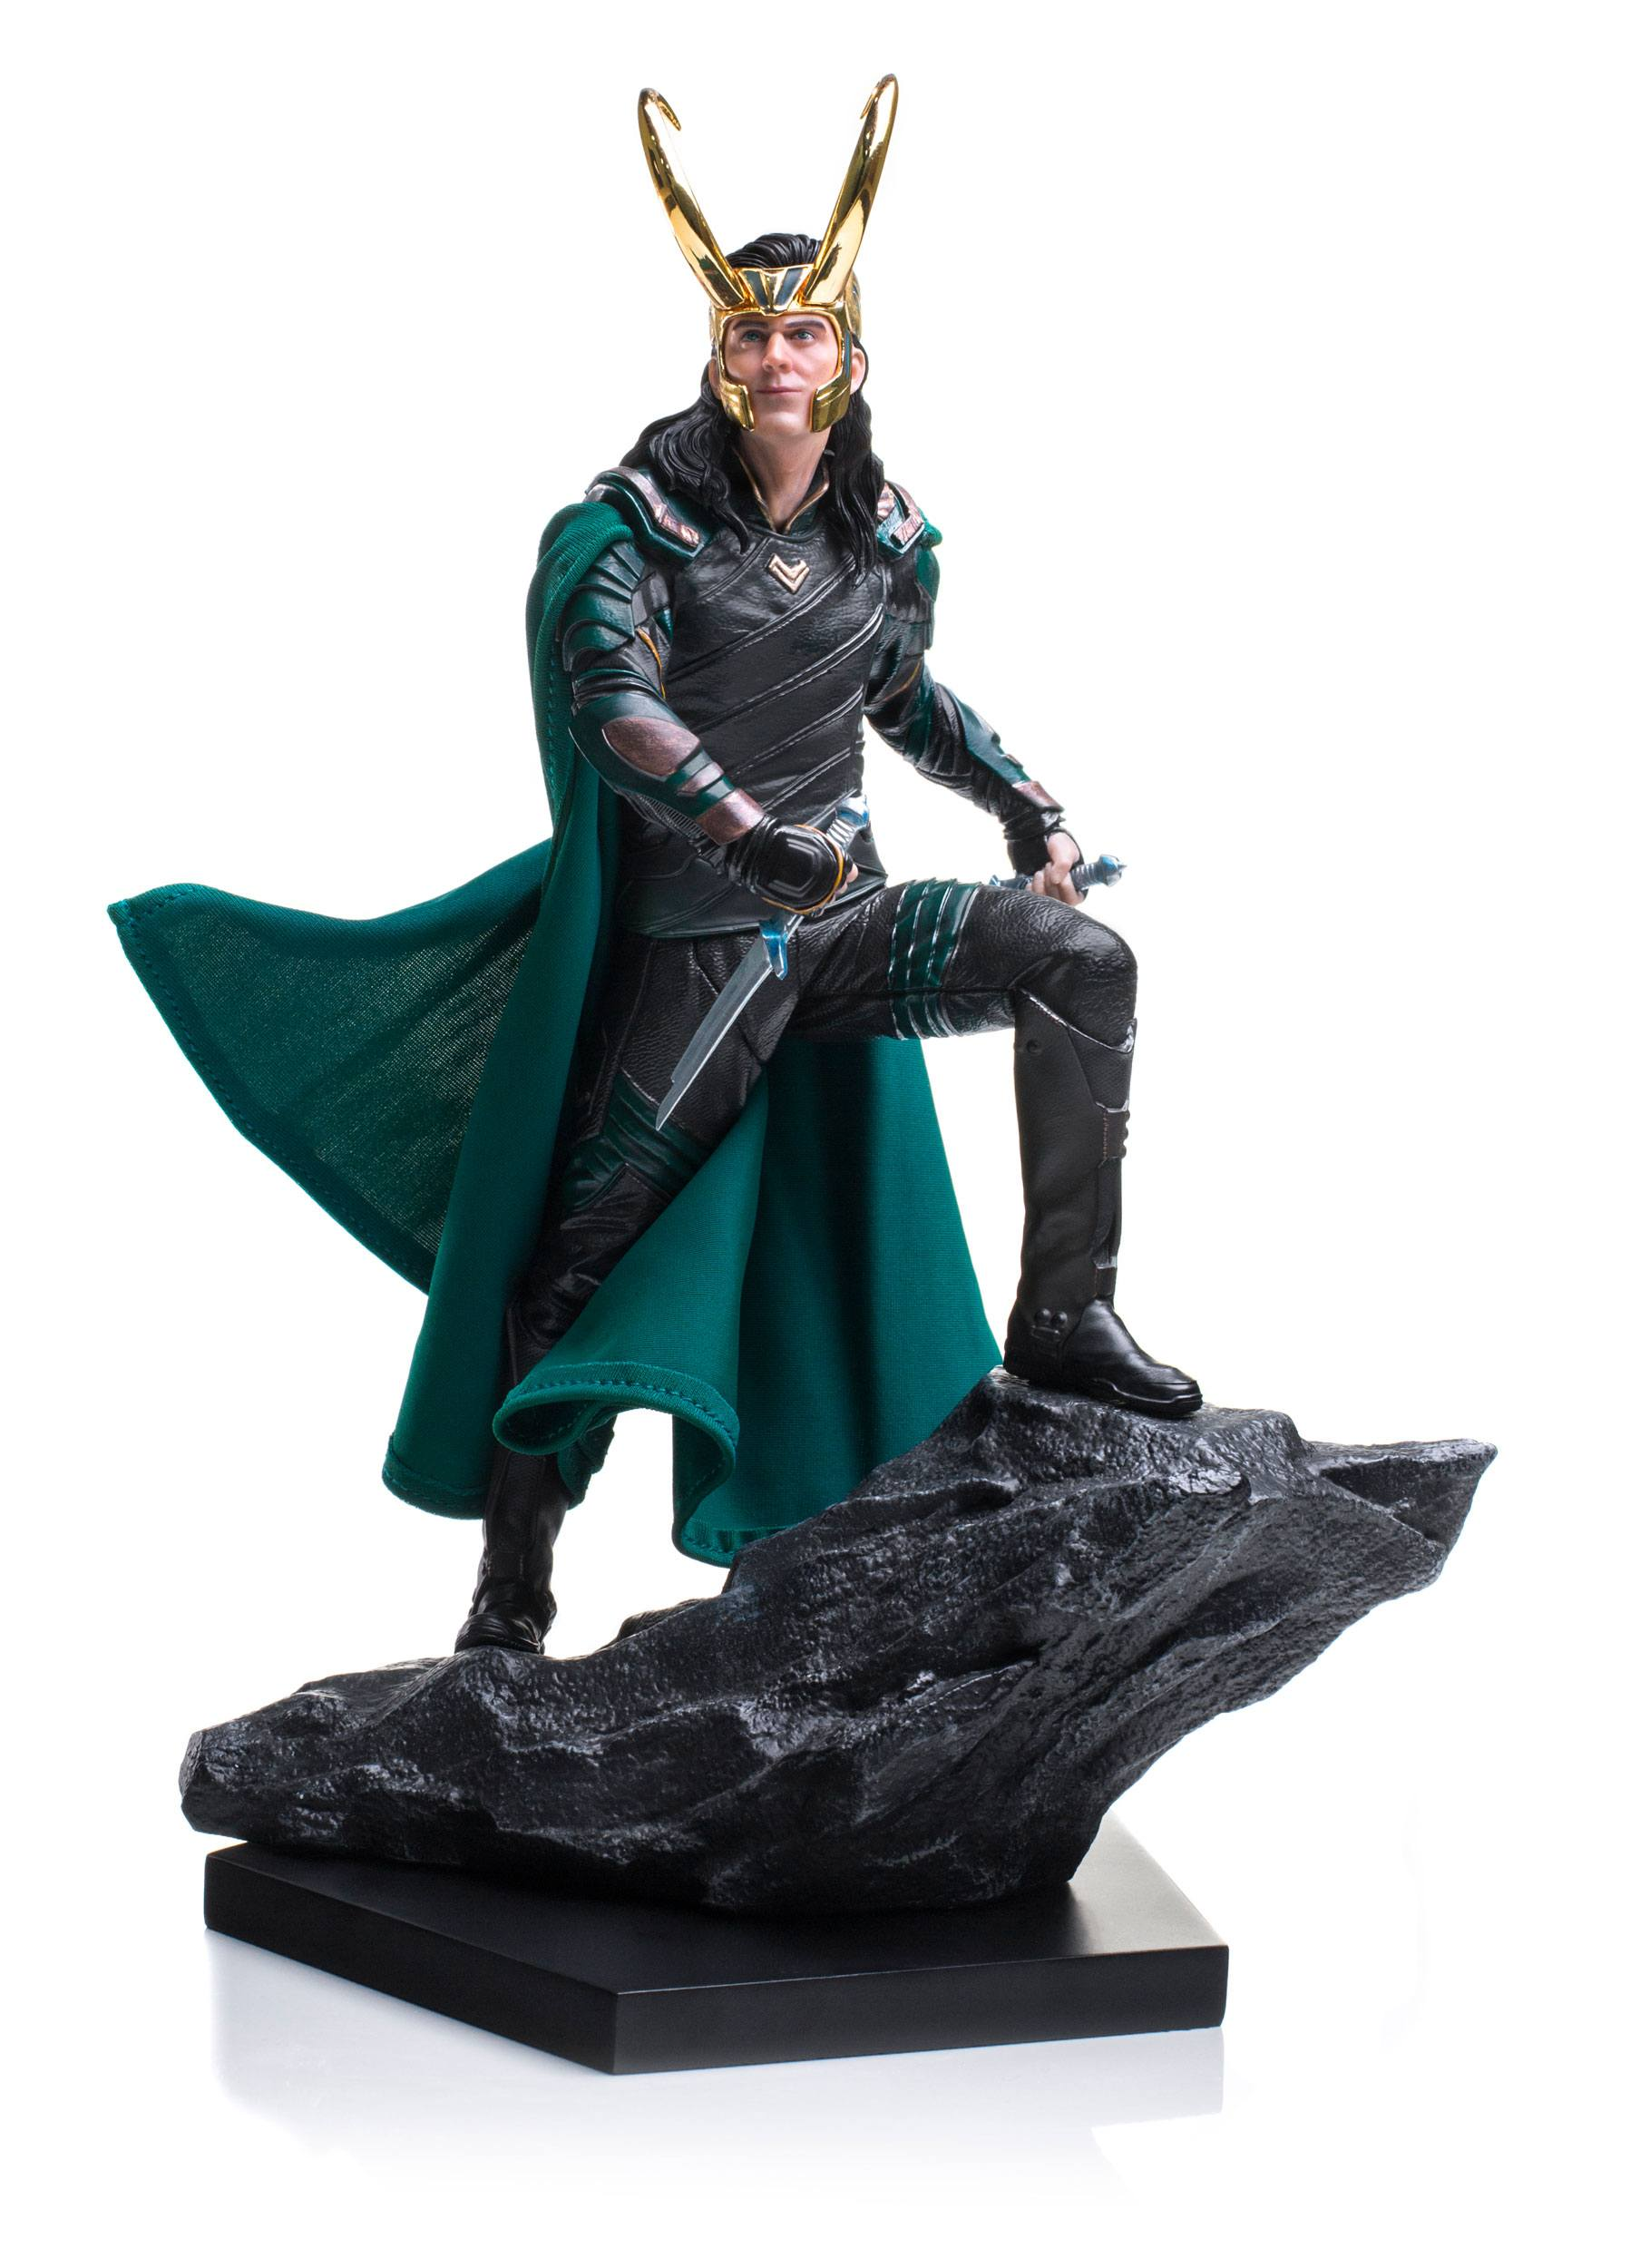 IRON STUDIOS Art Thor Ragnarok Loki 1//10 Scale Statue New with Box 25cm